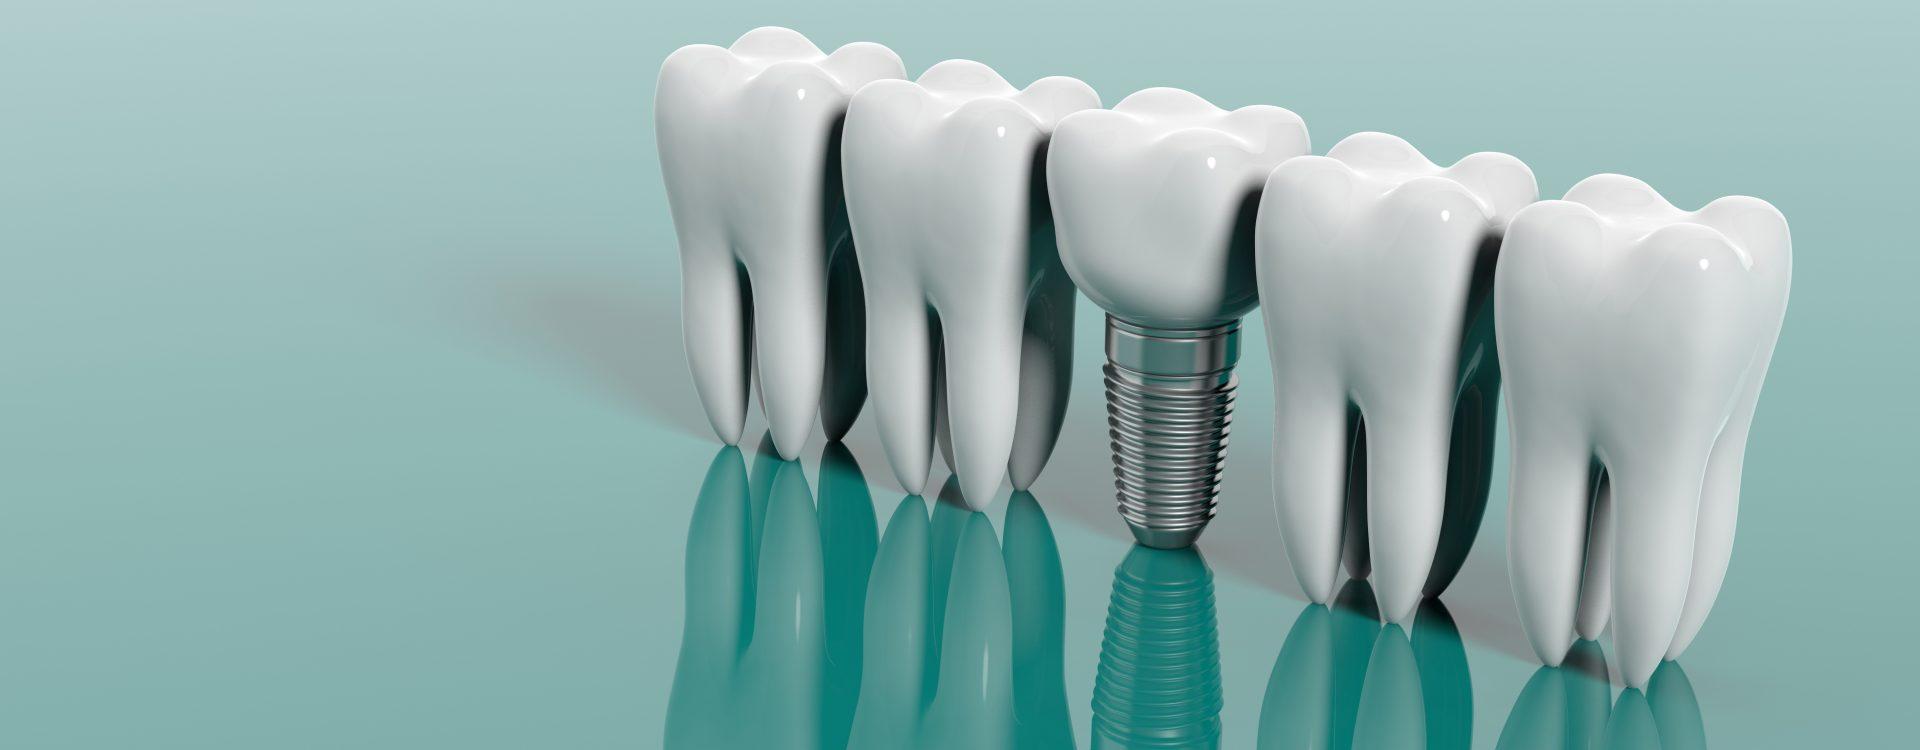 Diferencia-entre-implants-i-protesis dentals